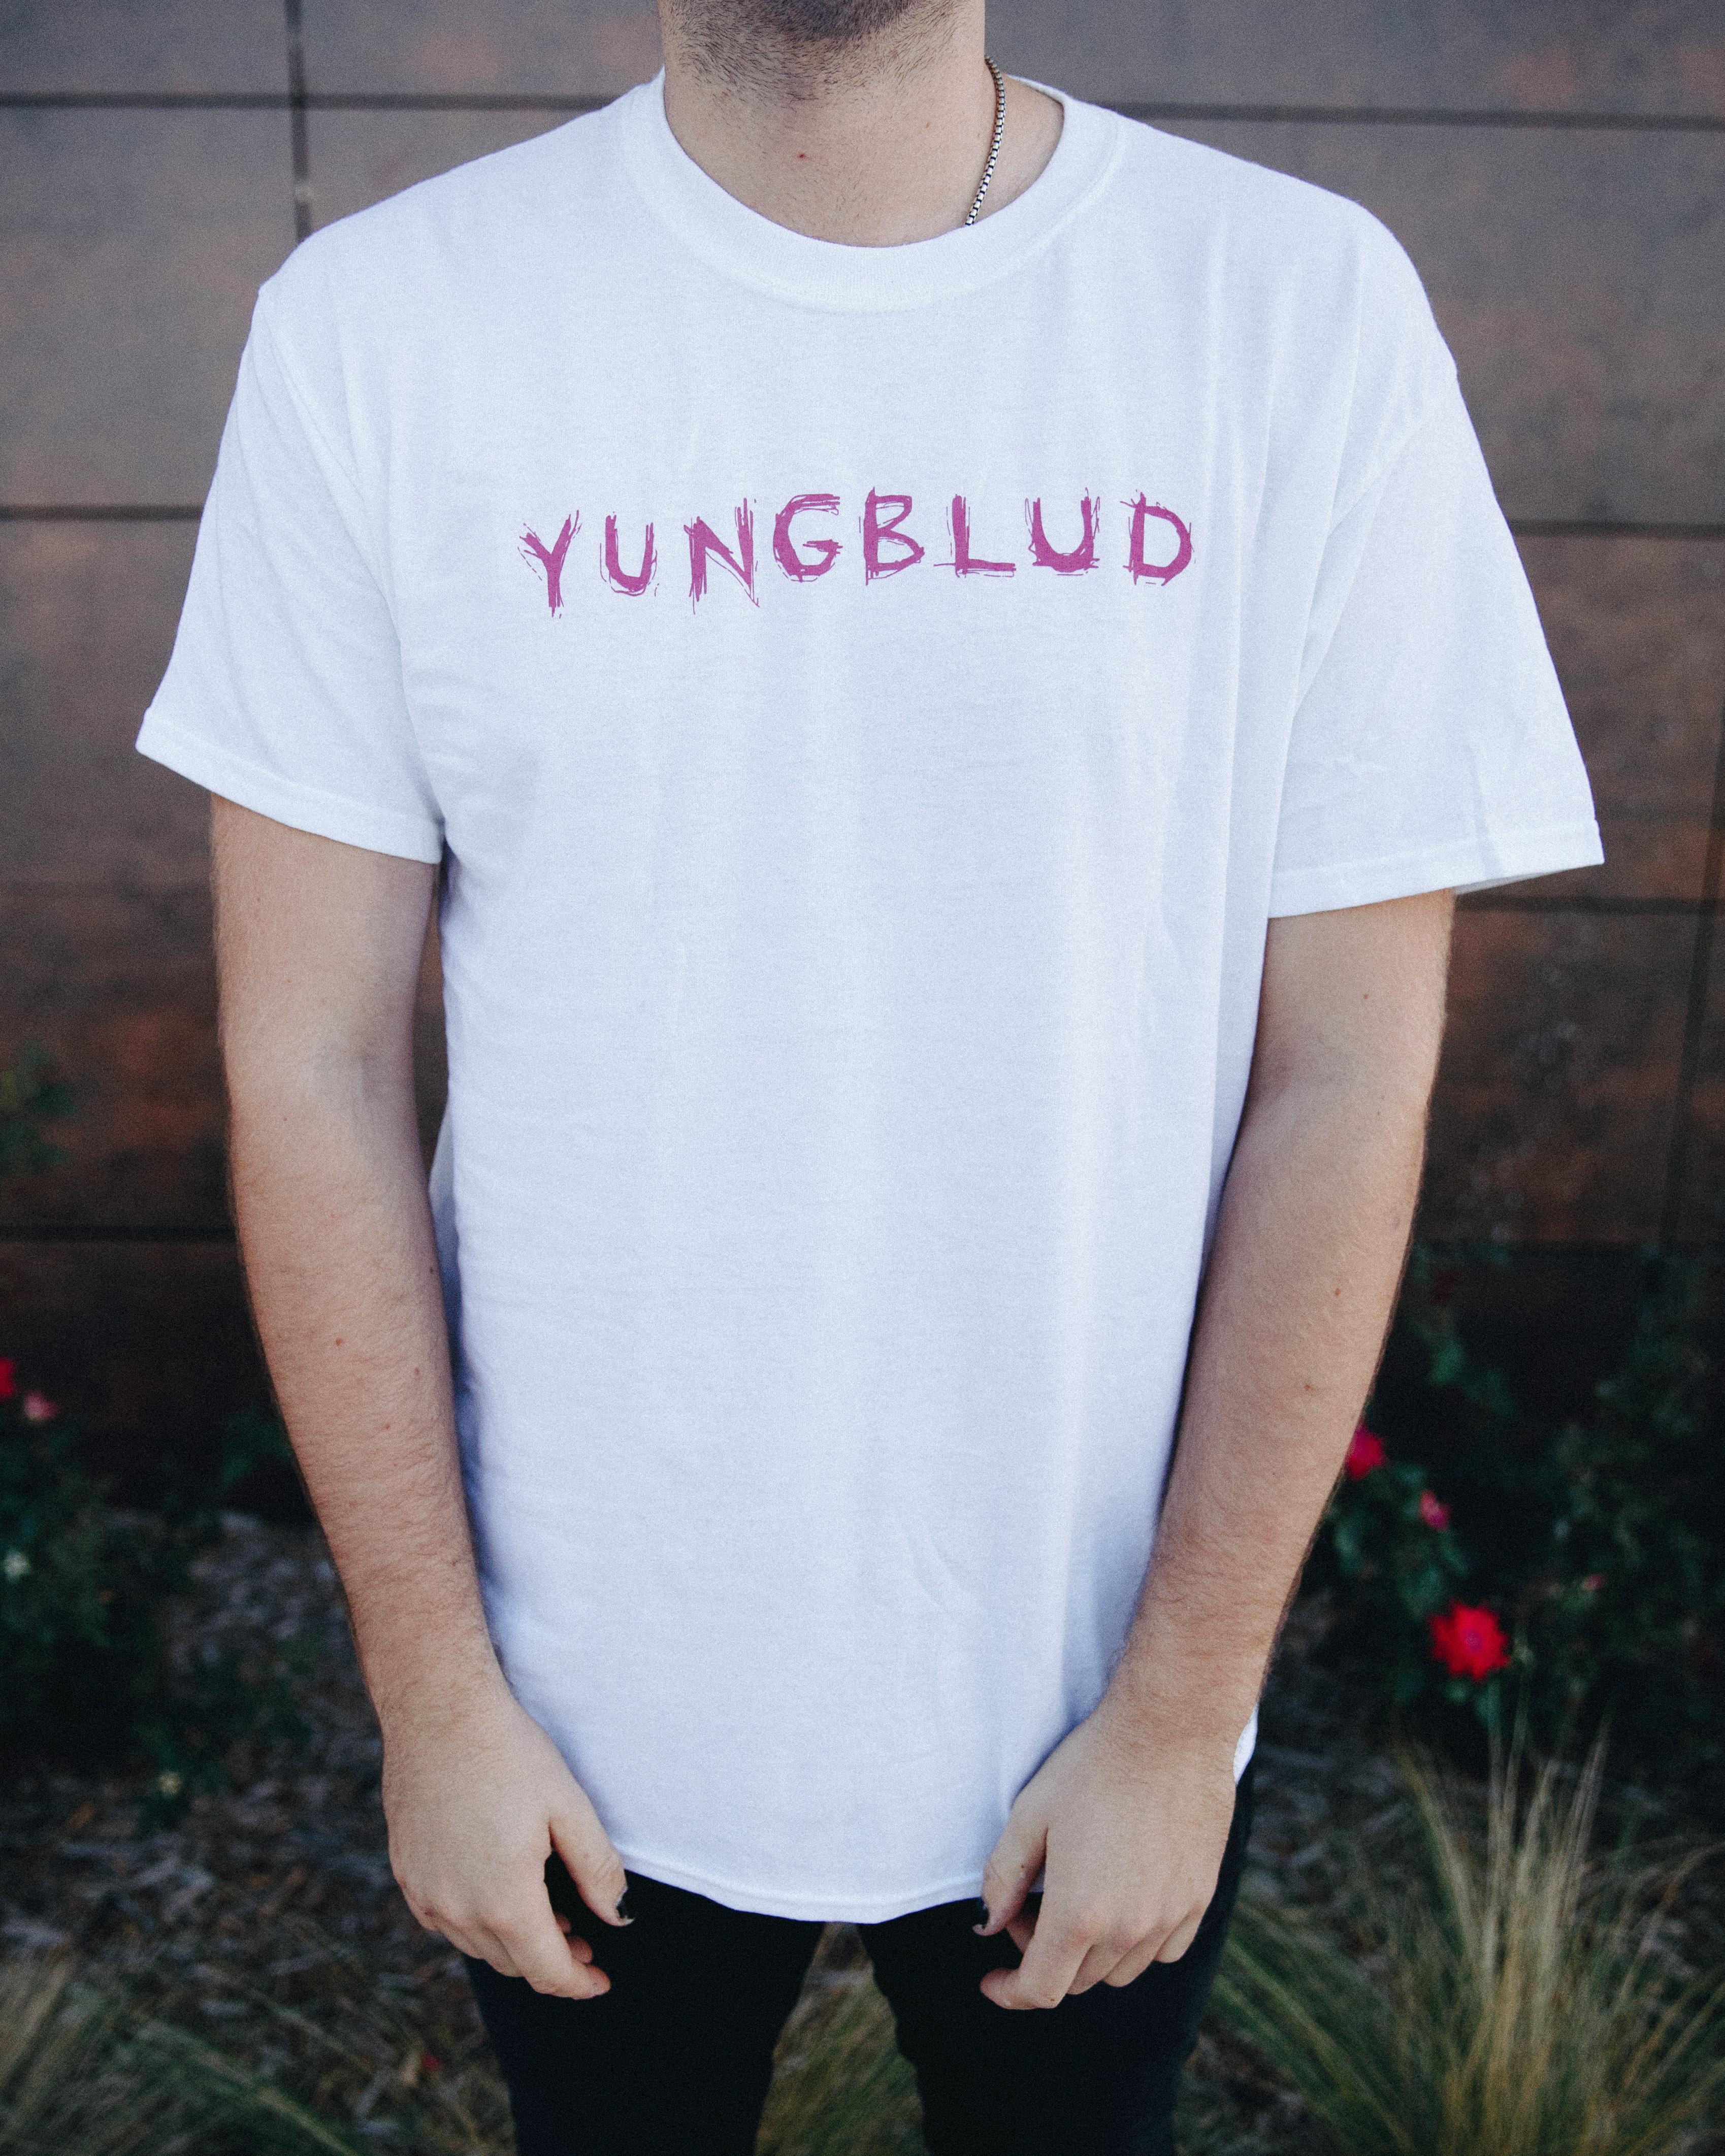 21CL T-Shirt - White - YUNGBLUDUSA